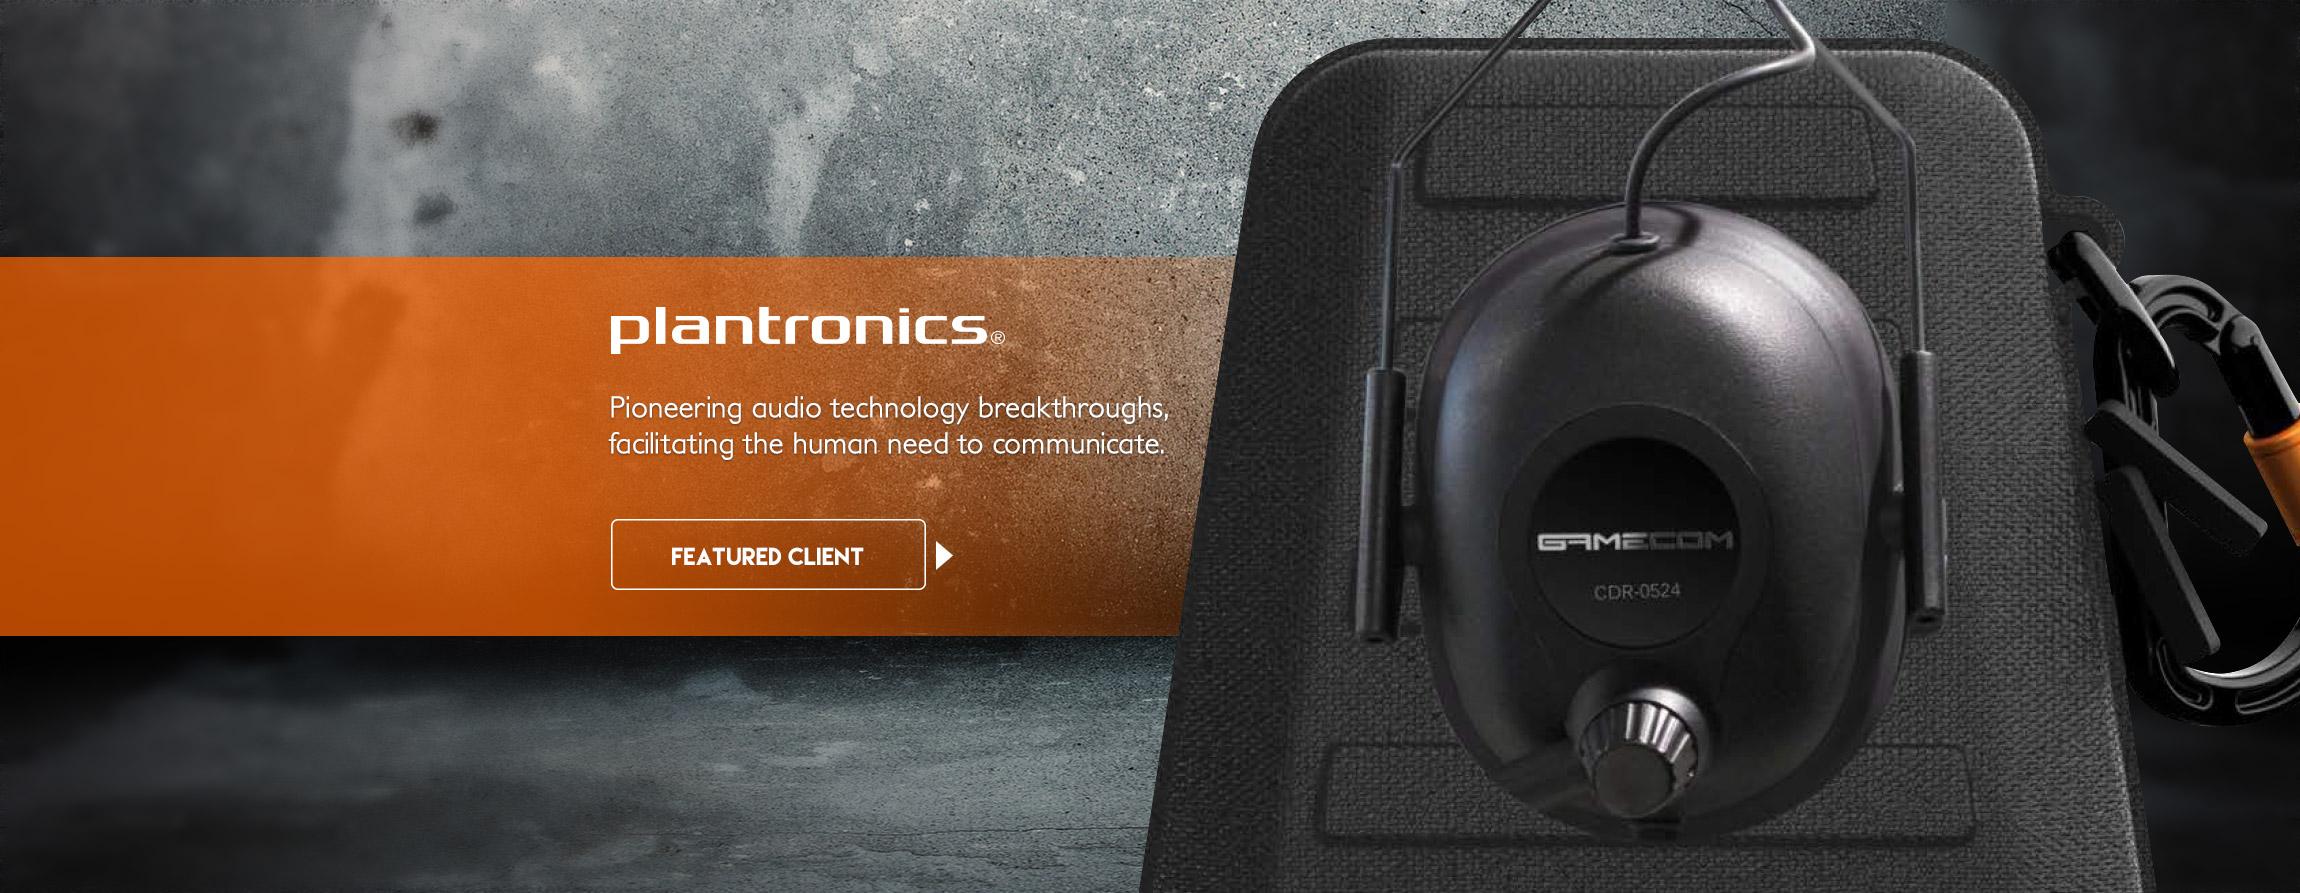 Plantronics PLT Commander audio gaming headphones packaging - Graphic Regime Chris Mark